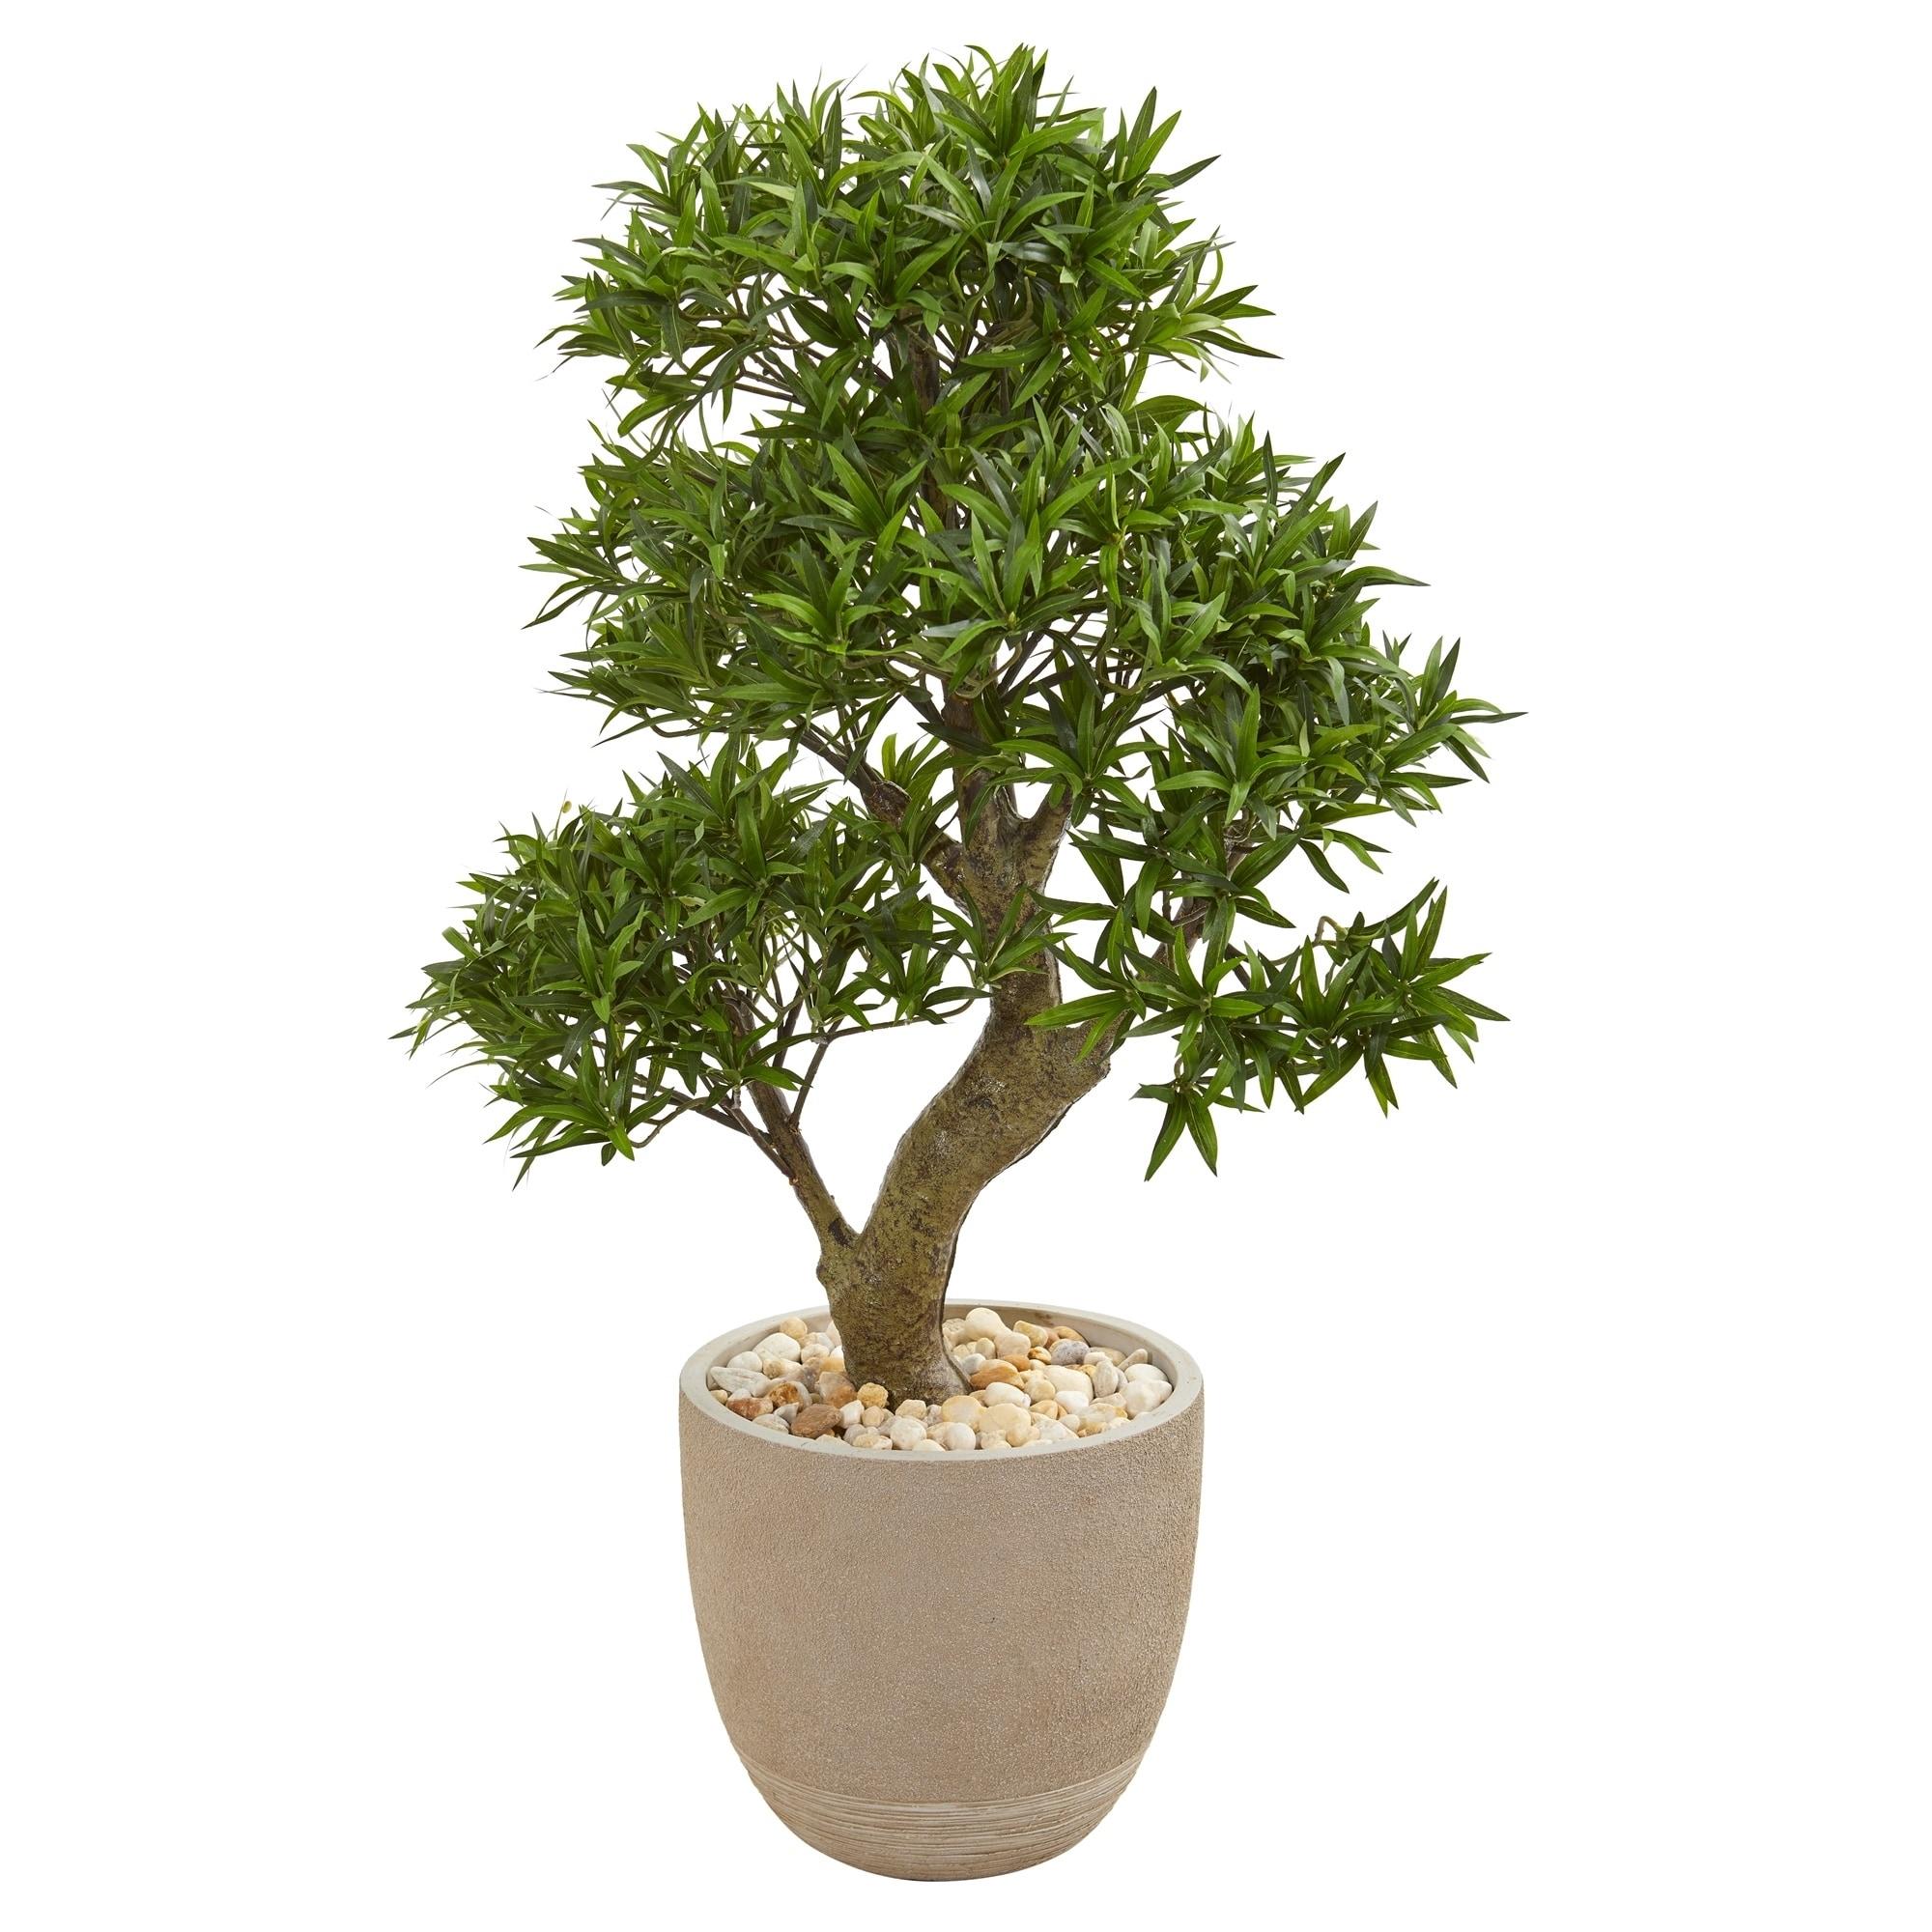 40 Podocarpus Artificial Bonsai Tree in Sandstone Planter